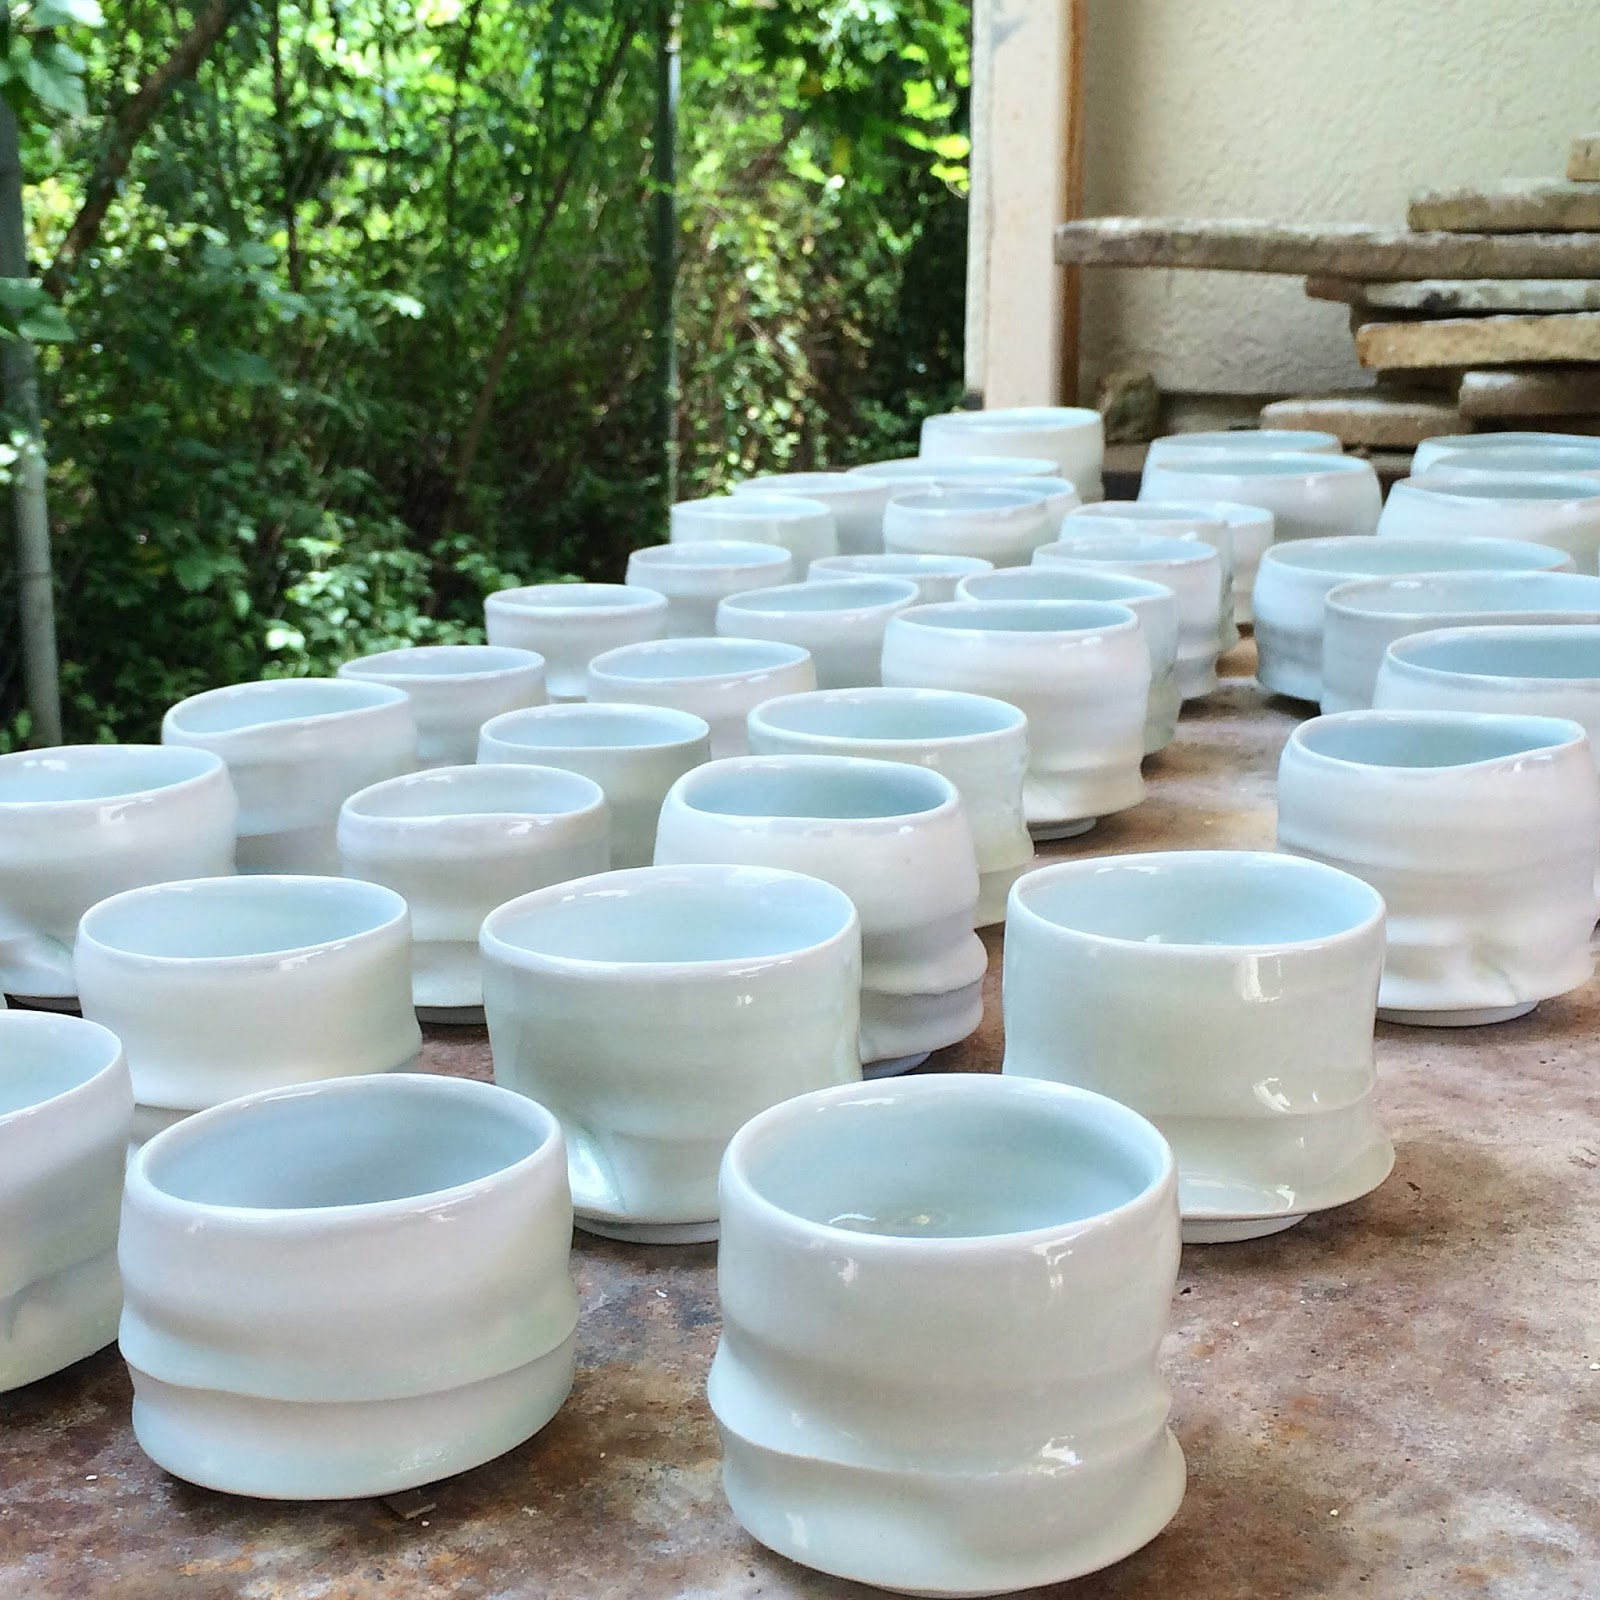 John Oles Ceramics